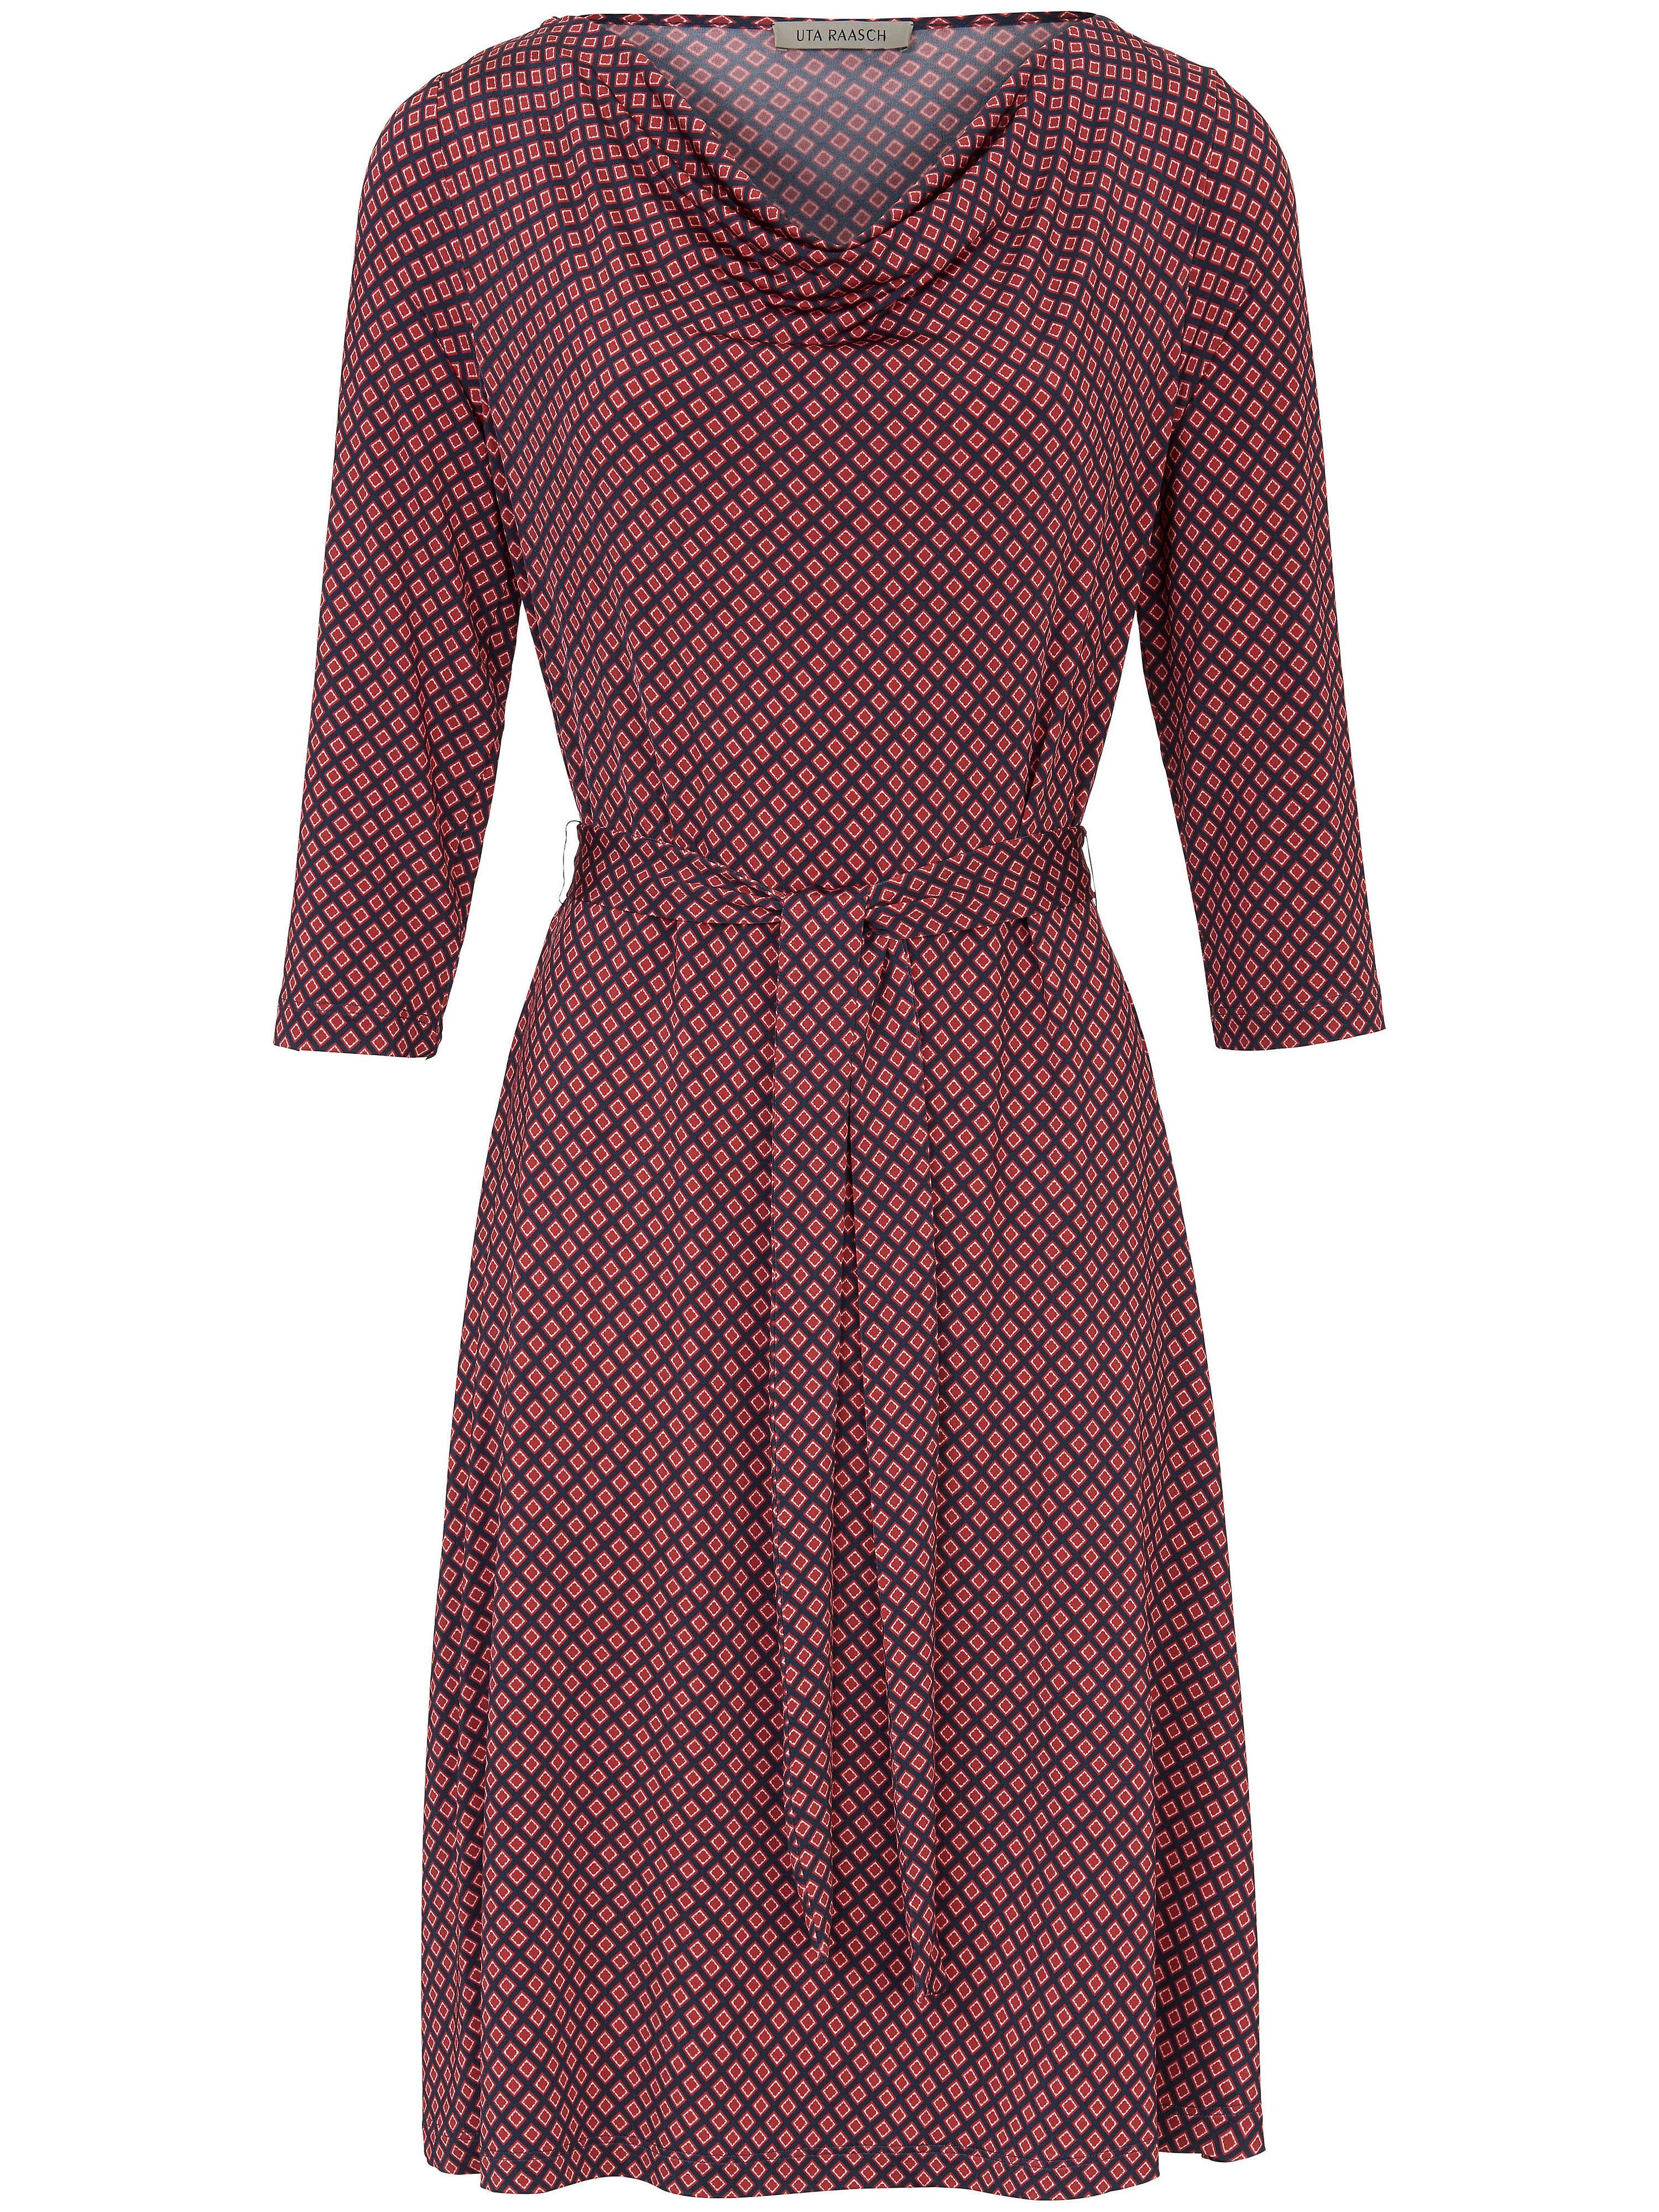 Image of   Jersey-kjole flot grafisk print Fra Uta Raasch multicolor